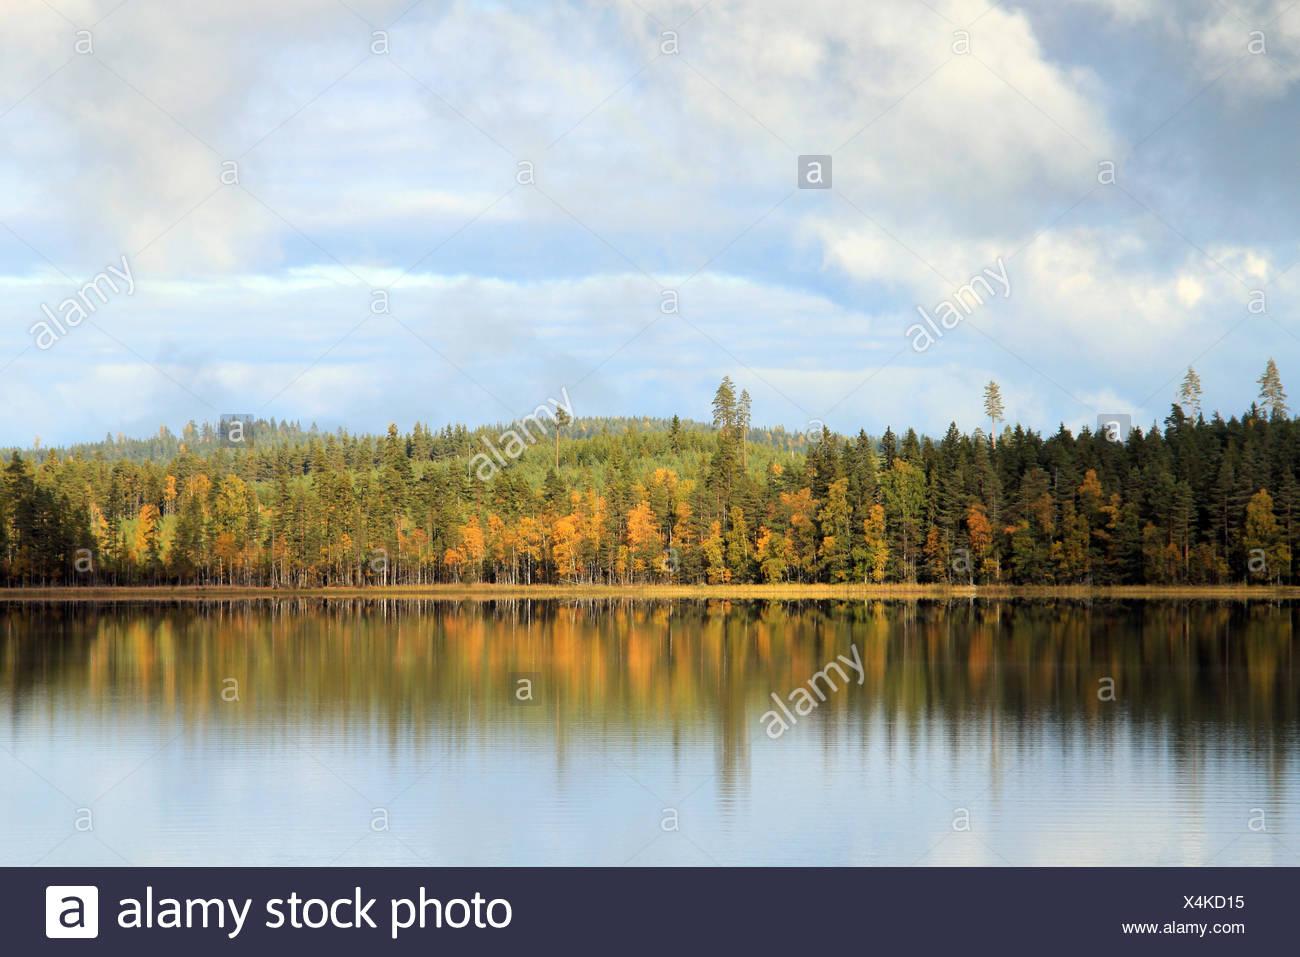 Autumn Lake - Stock Image